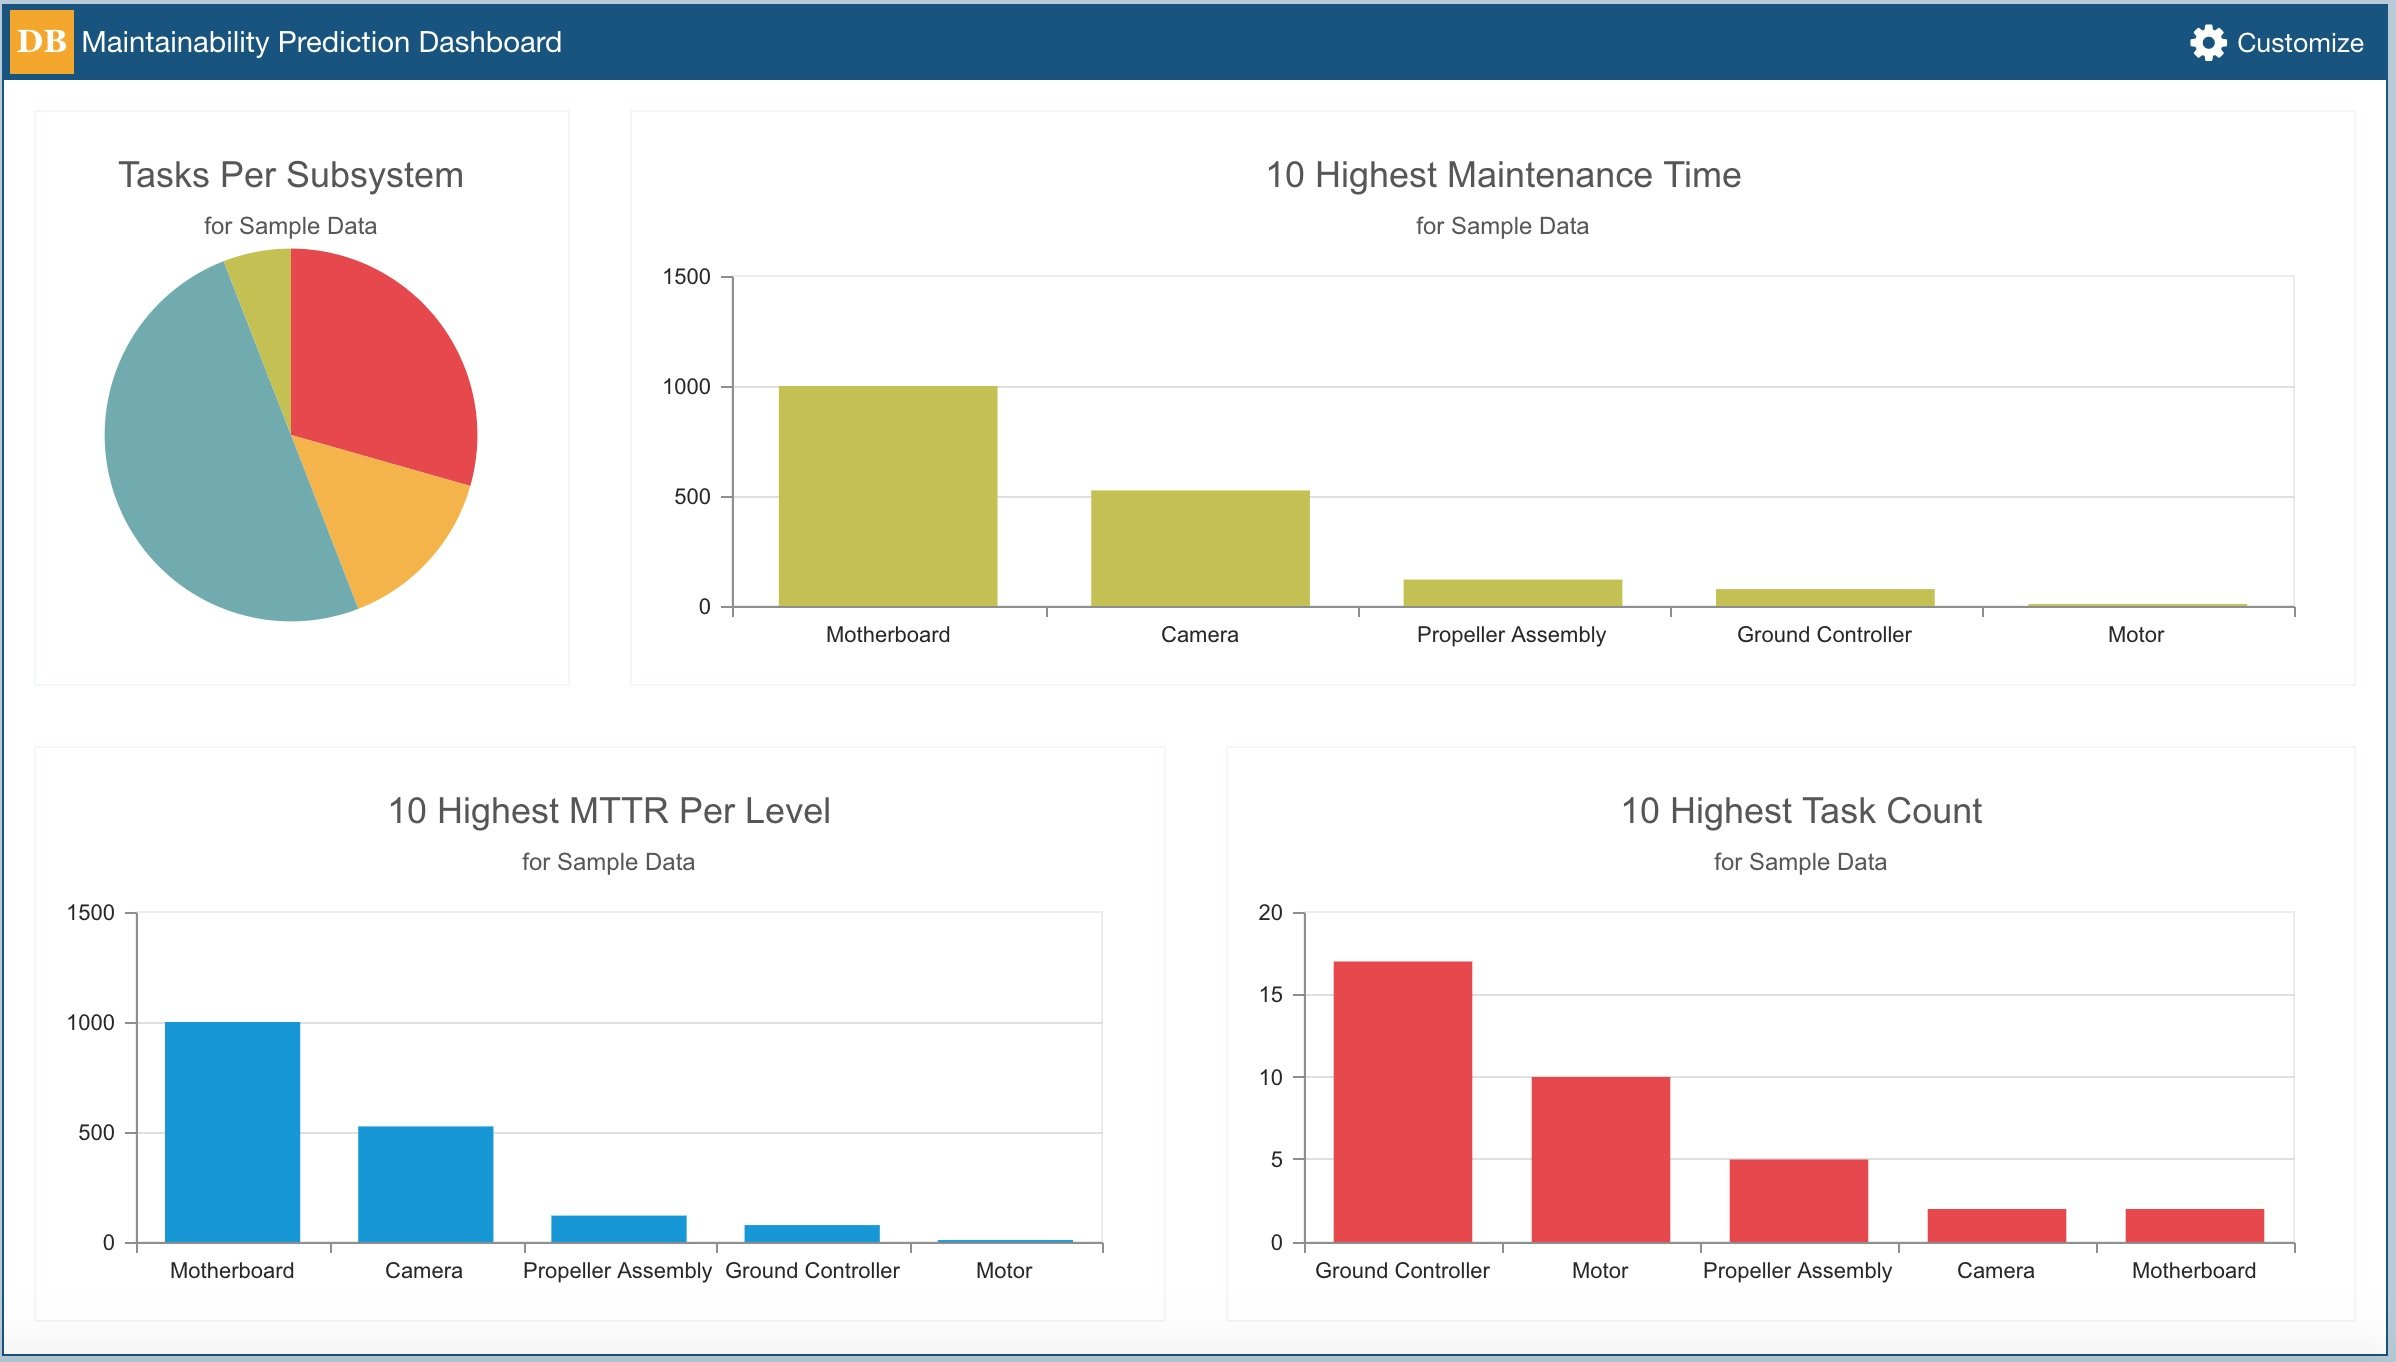 Maintainability Prediction Dashboard